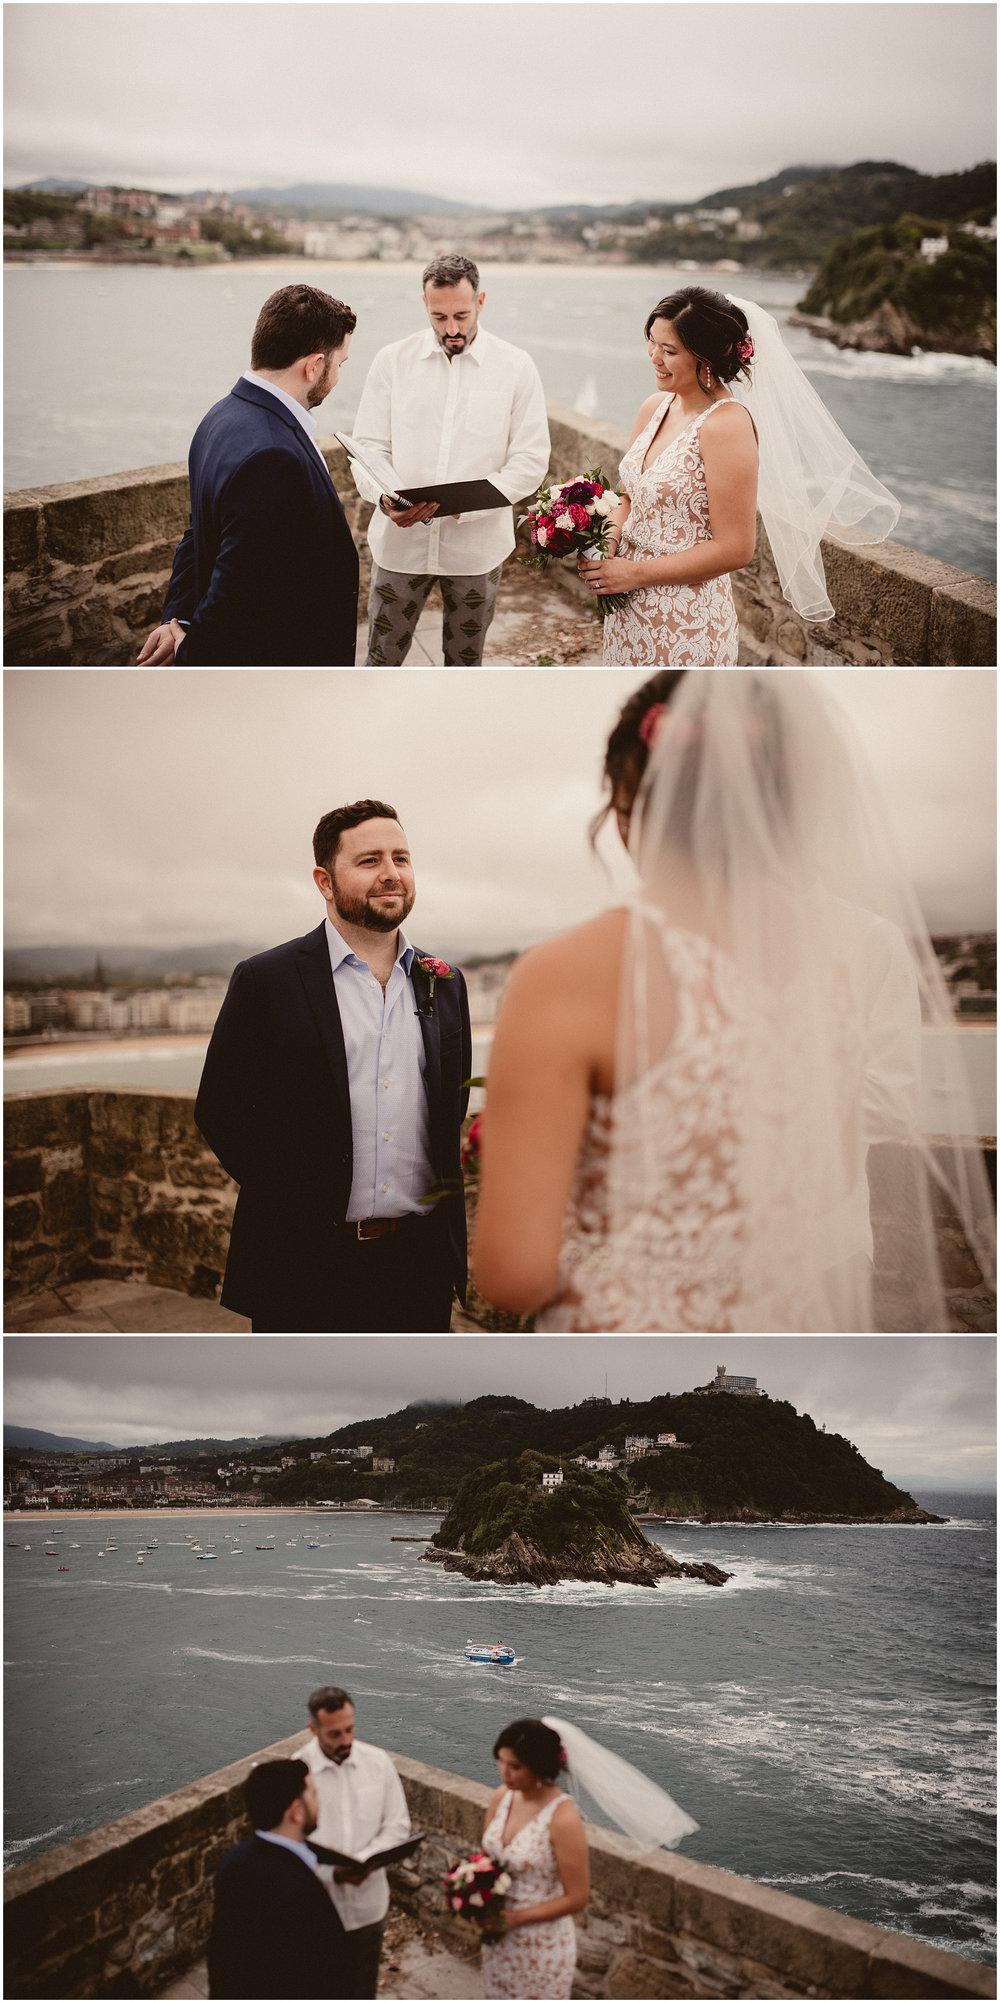 Brian & Julia - Destination wedding in San Sebastián  - Elopement in San Sebastian- ARTEFOTO27.jpg